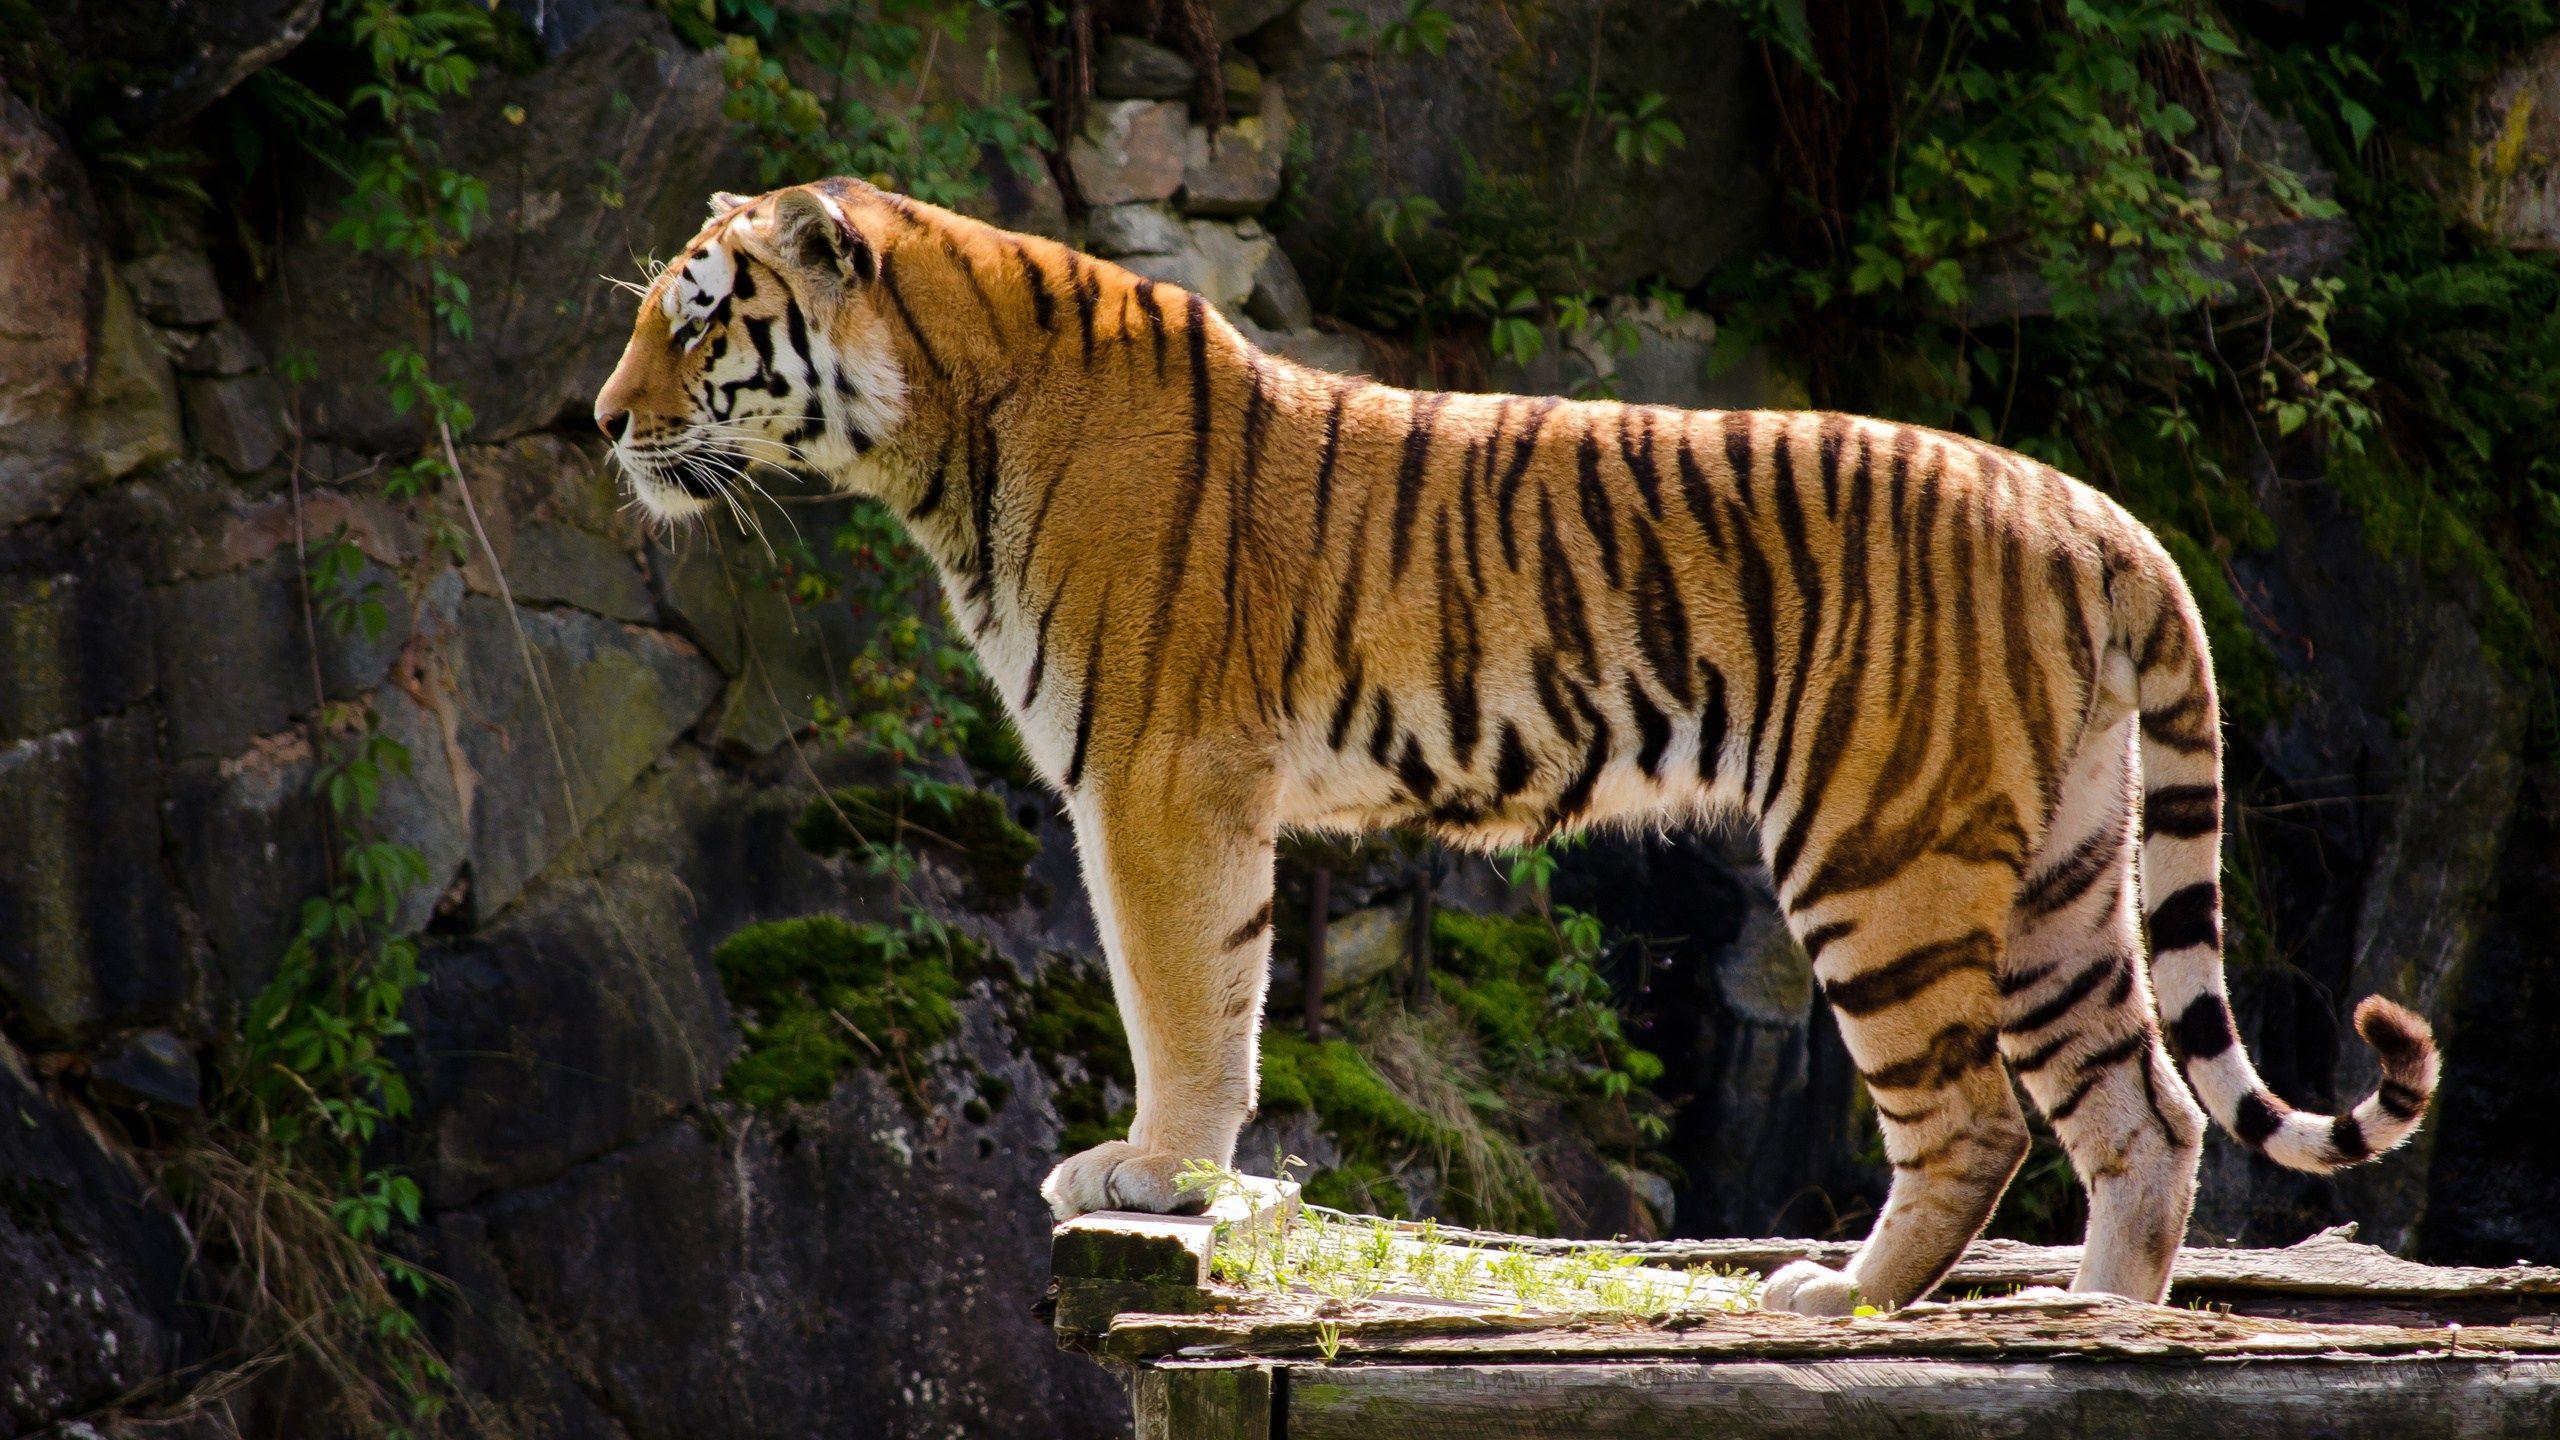 tigers photos hd